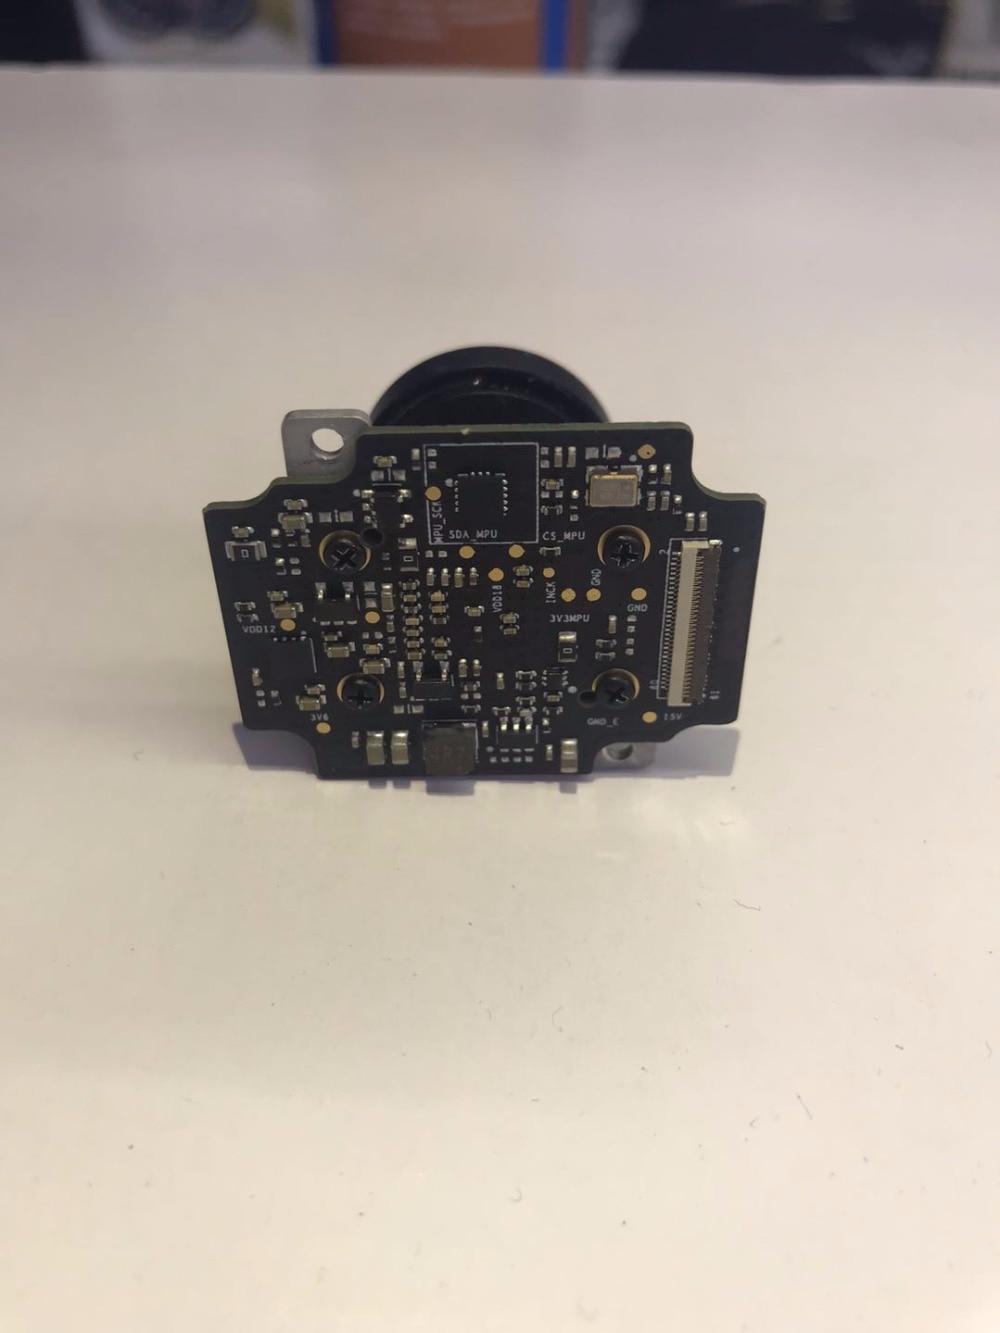 Original DJI Phantom 3 4K Gimbal Camera Lens Rapair Part For DJI Phantom 3 4K Drone (Tested) fpv 3 axis cnc metal brushless gimbal with controller for dji phantom camera drone for gopro 3 4 action sport camera only 180g